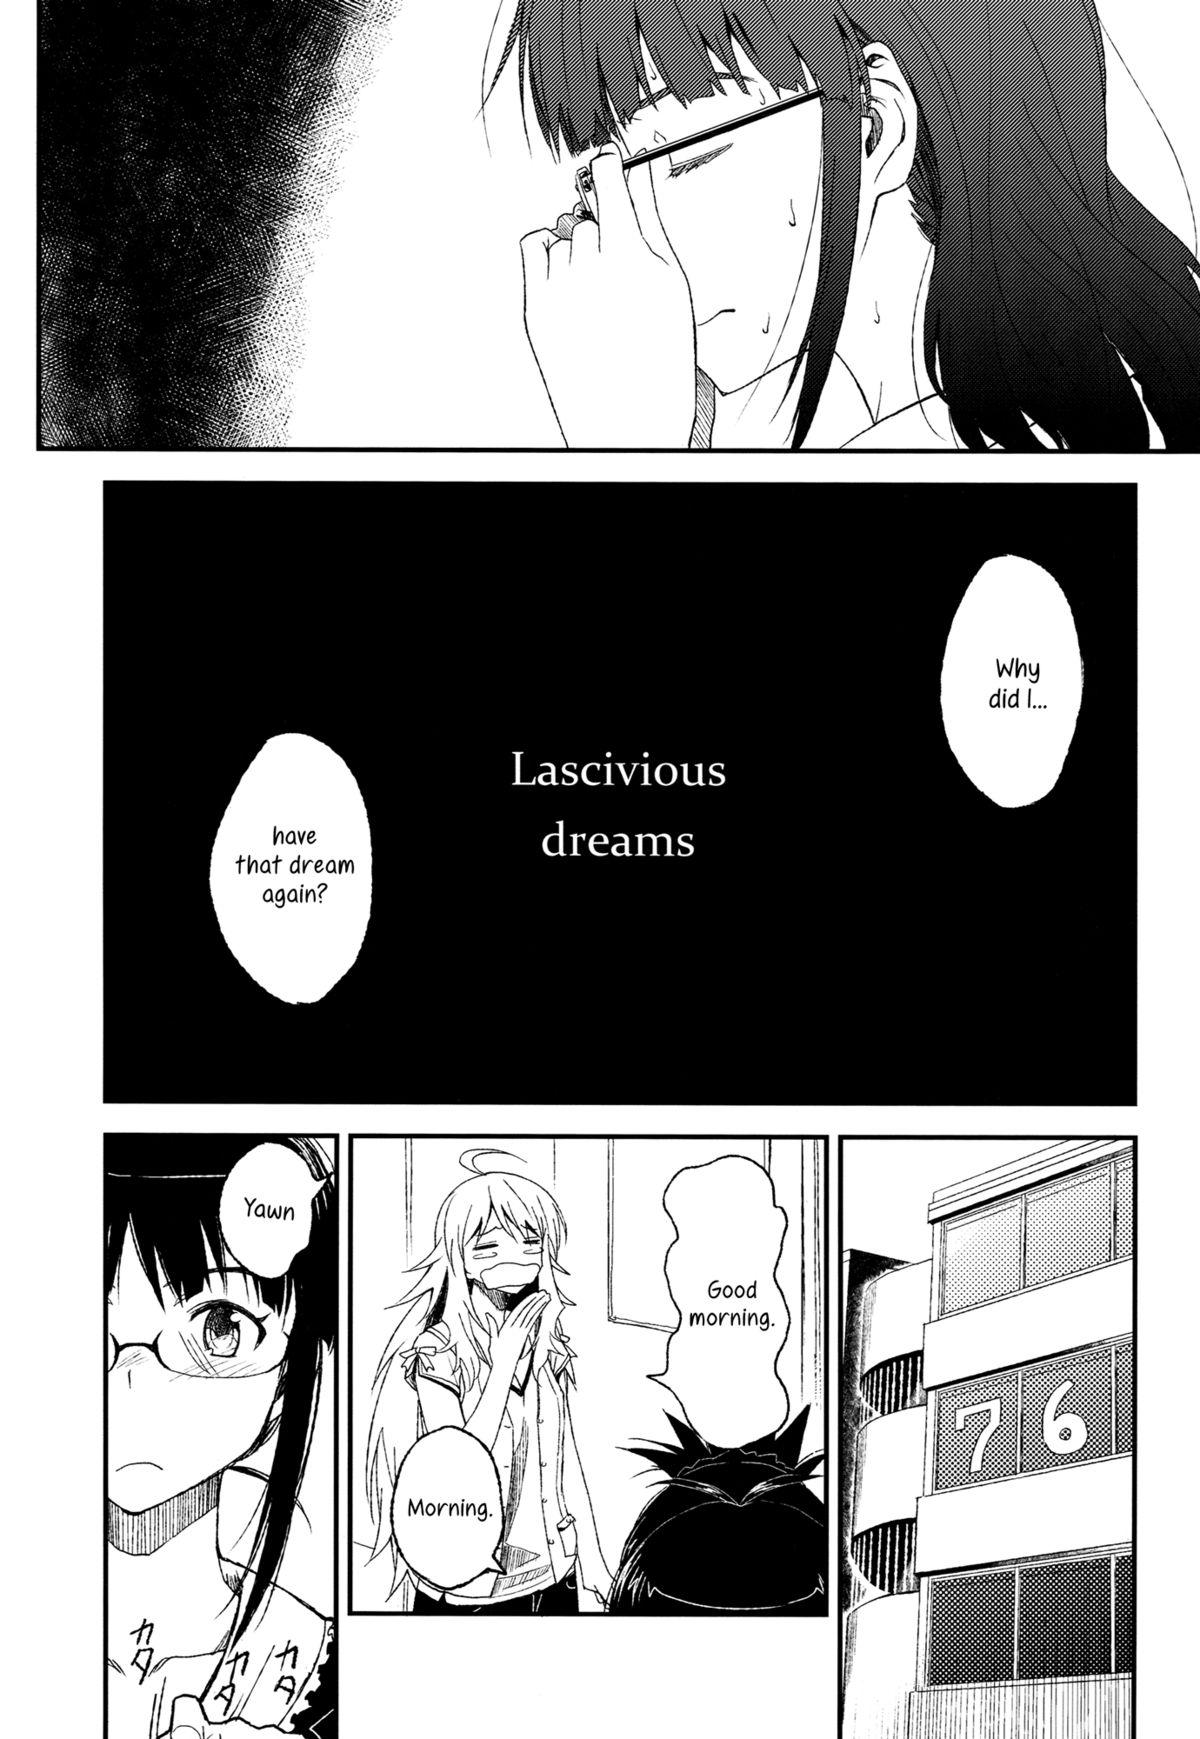 Lascivious Dreams 3